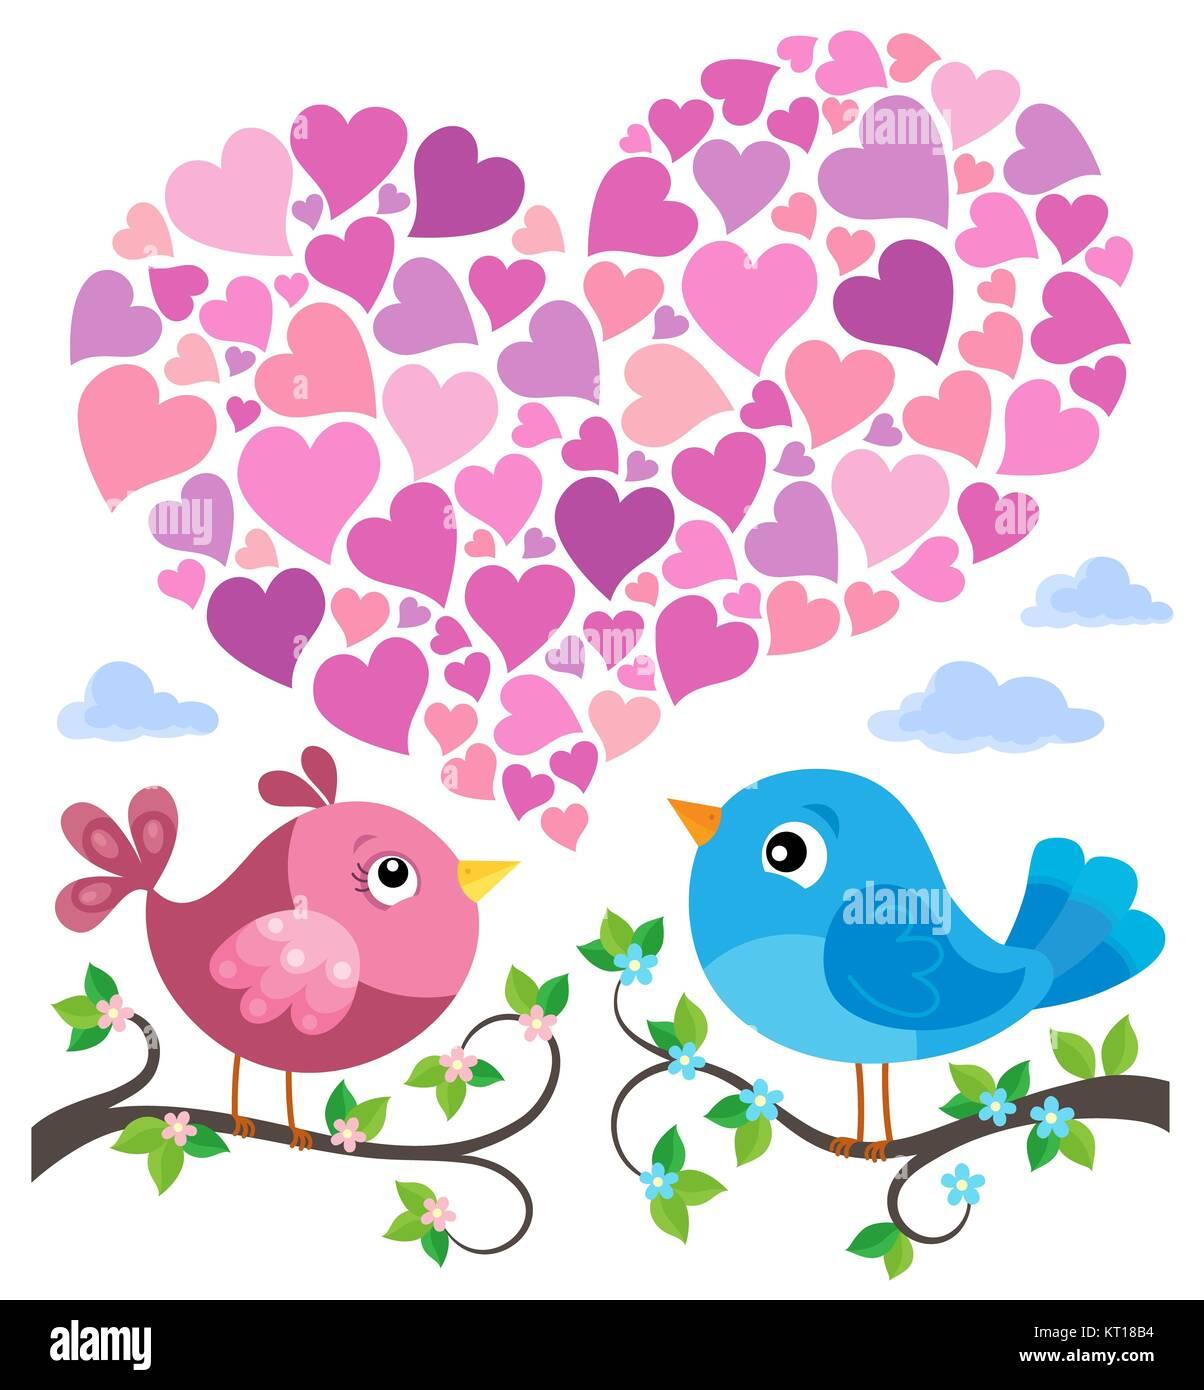 Valentine birds with heart shape theme 1 - Stock Image